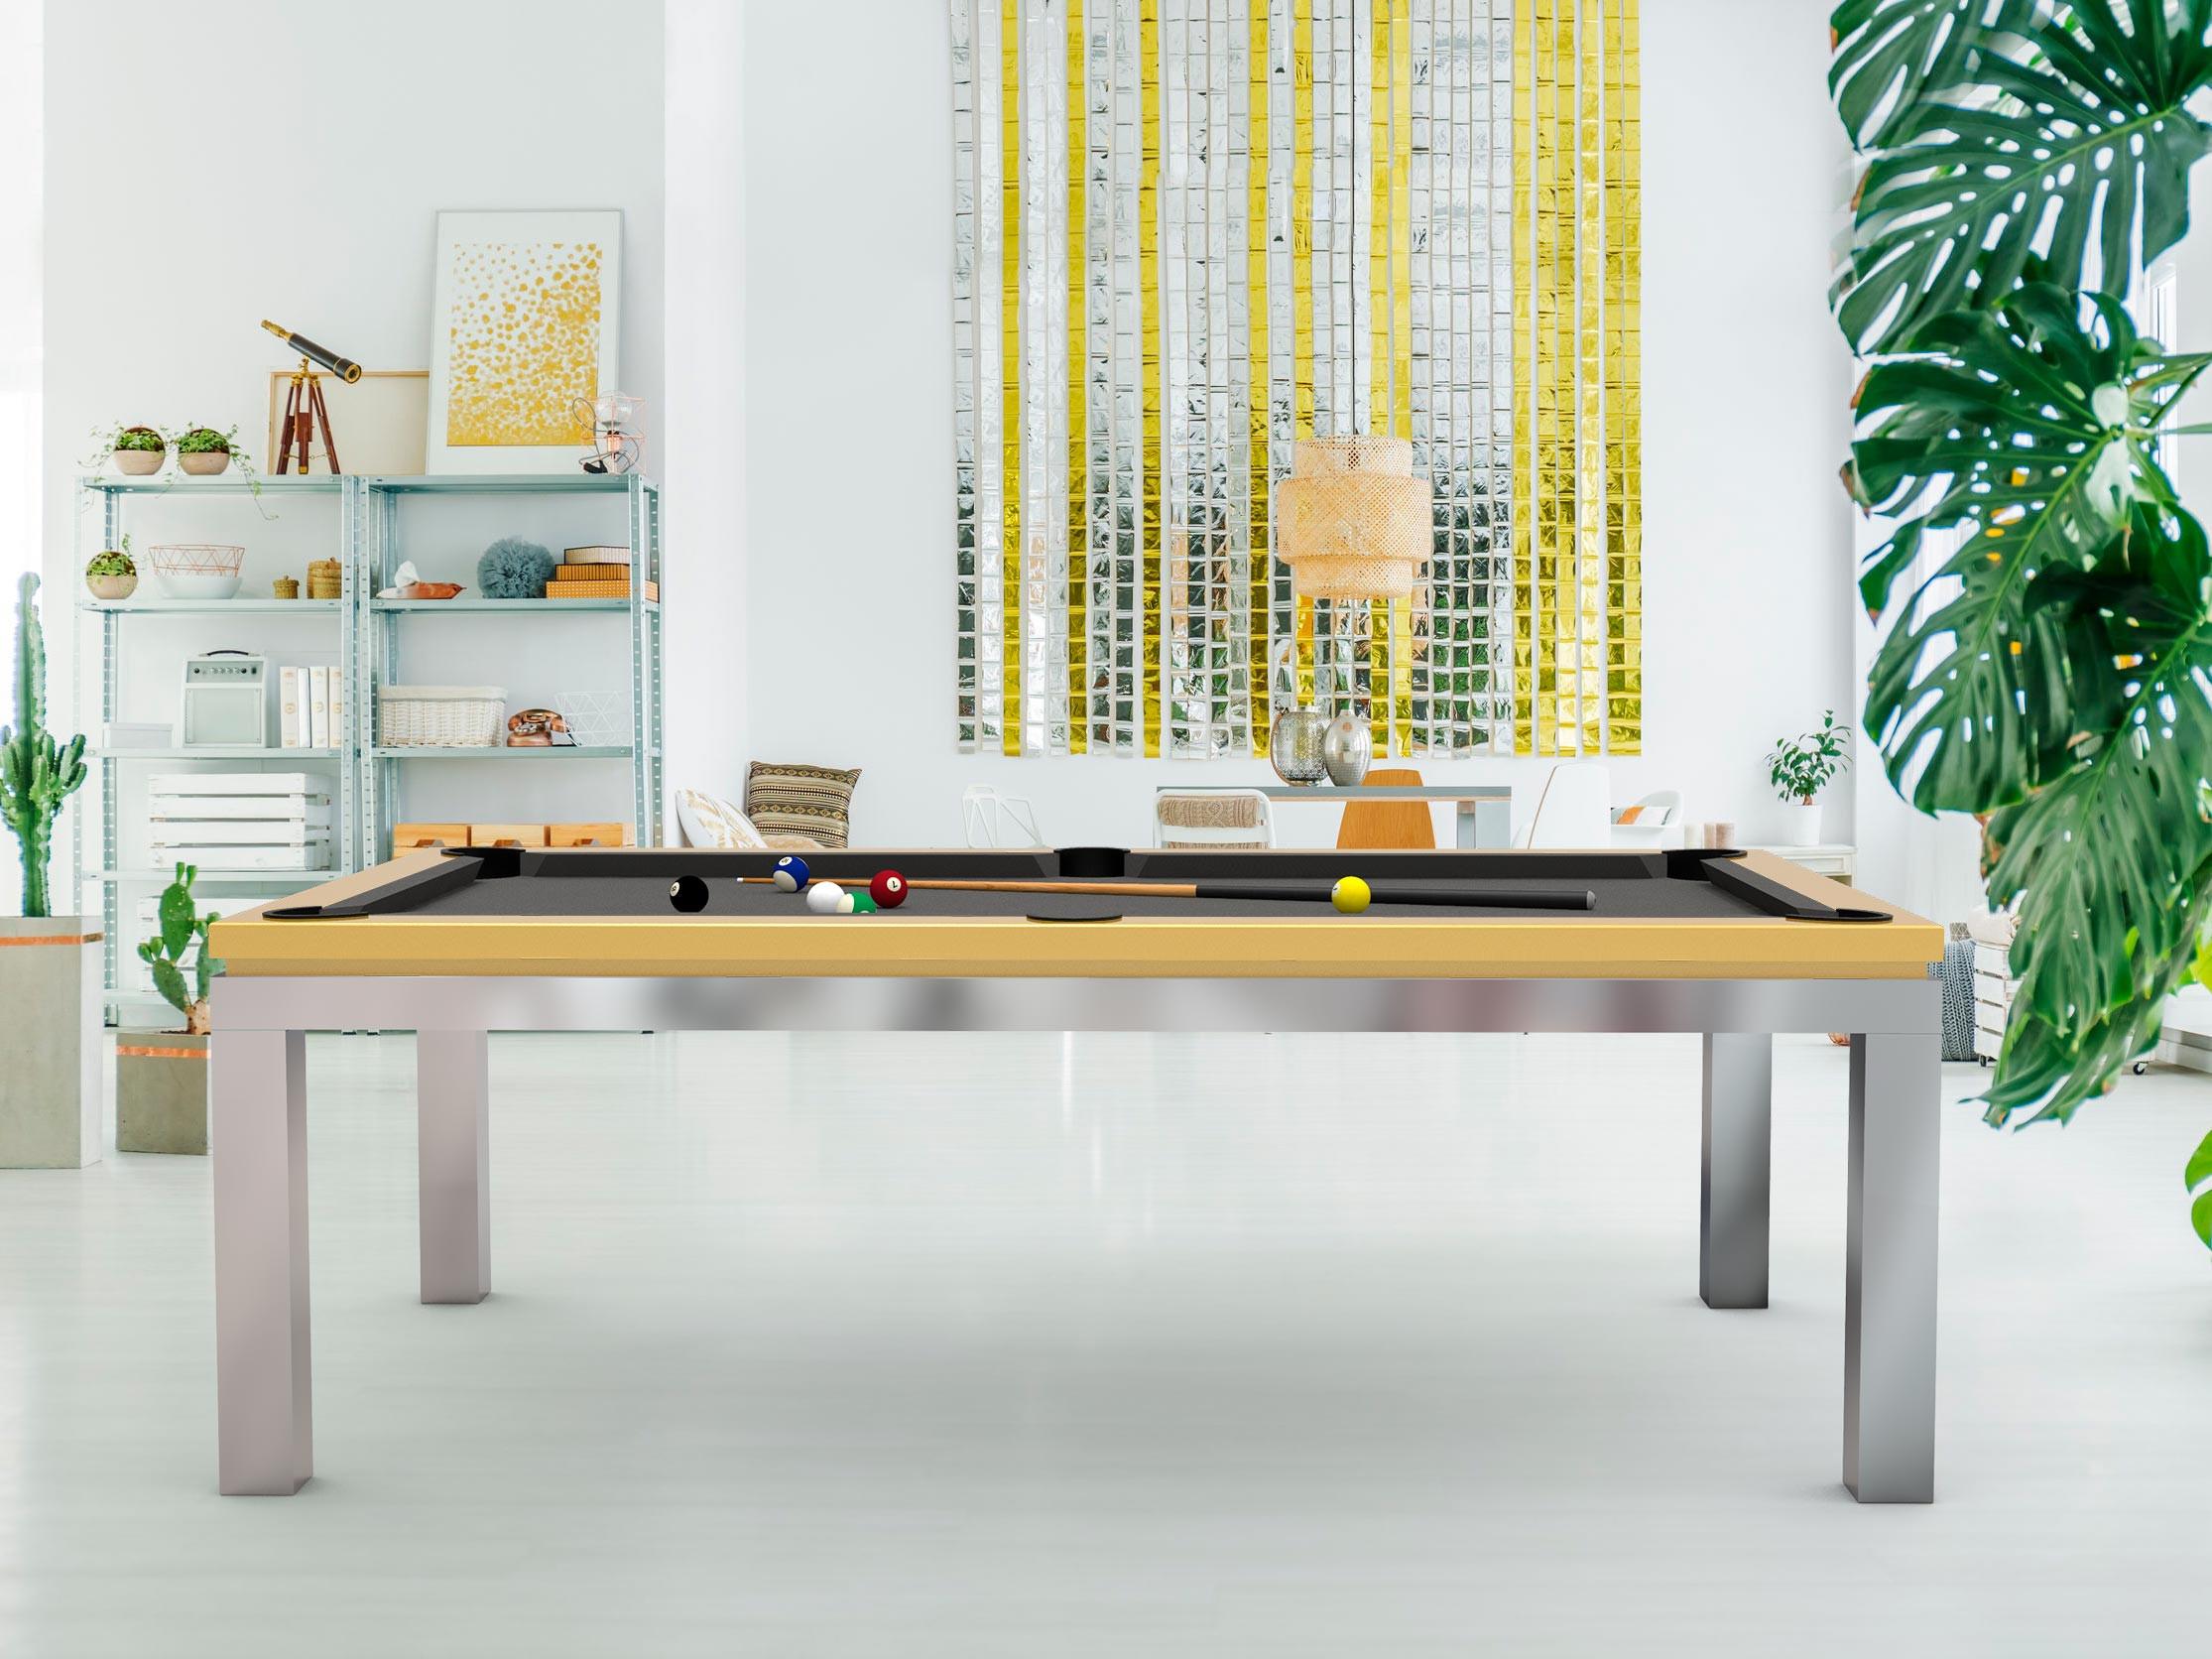 Billard NEW TENDANCE Table Inox - cadre laque nacré Pearl Gold 1036 - tapis grais ardoise